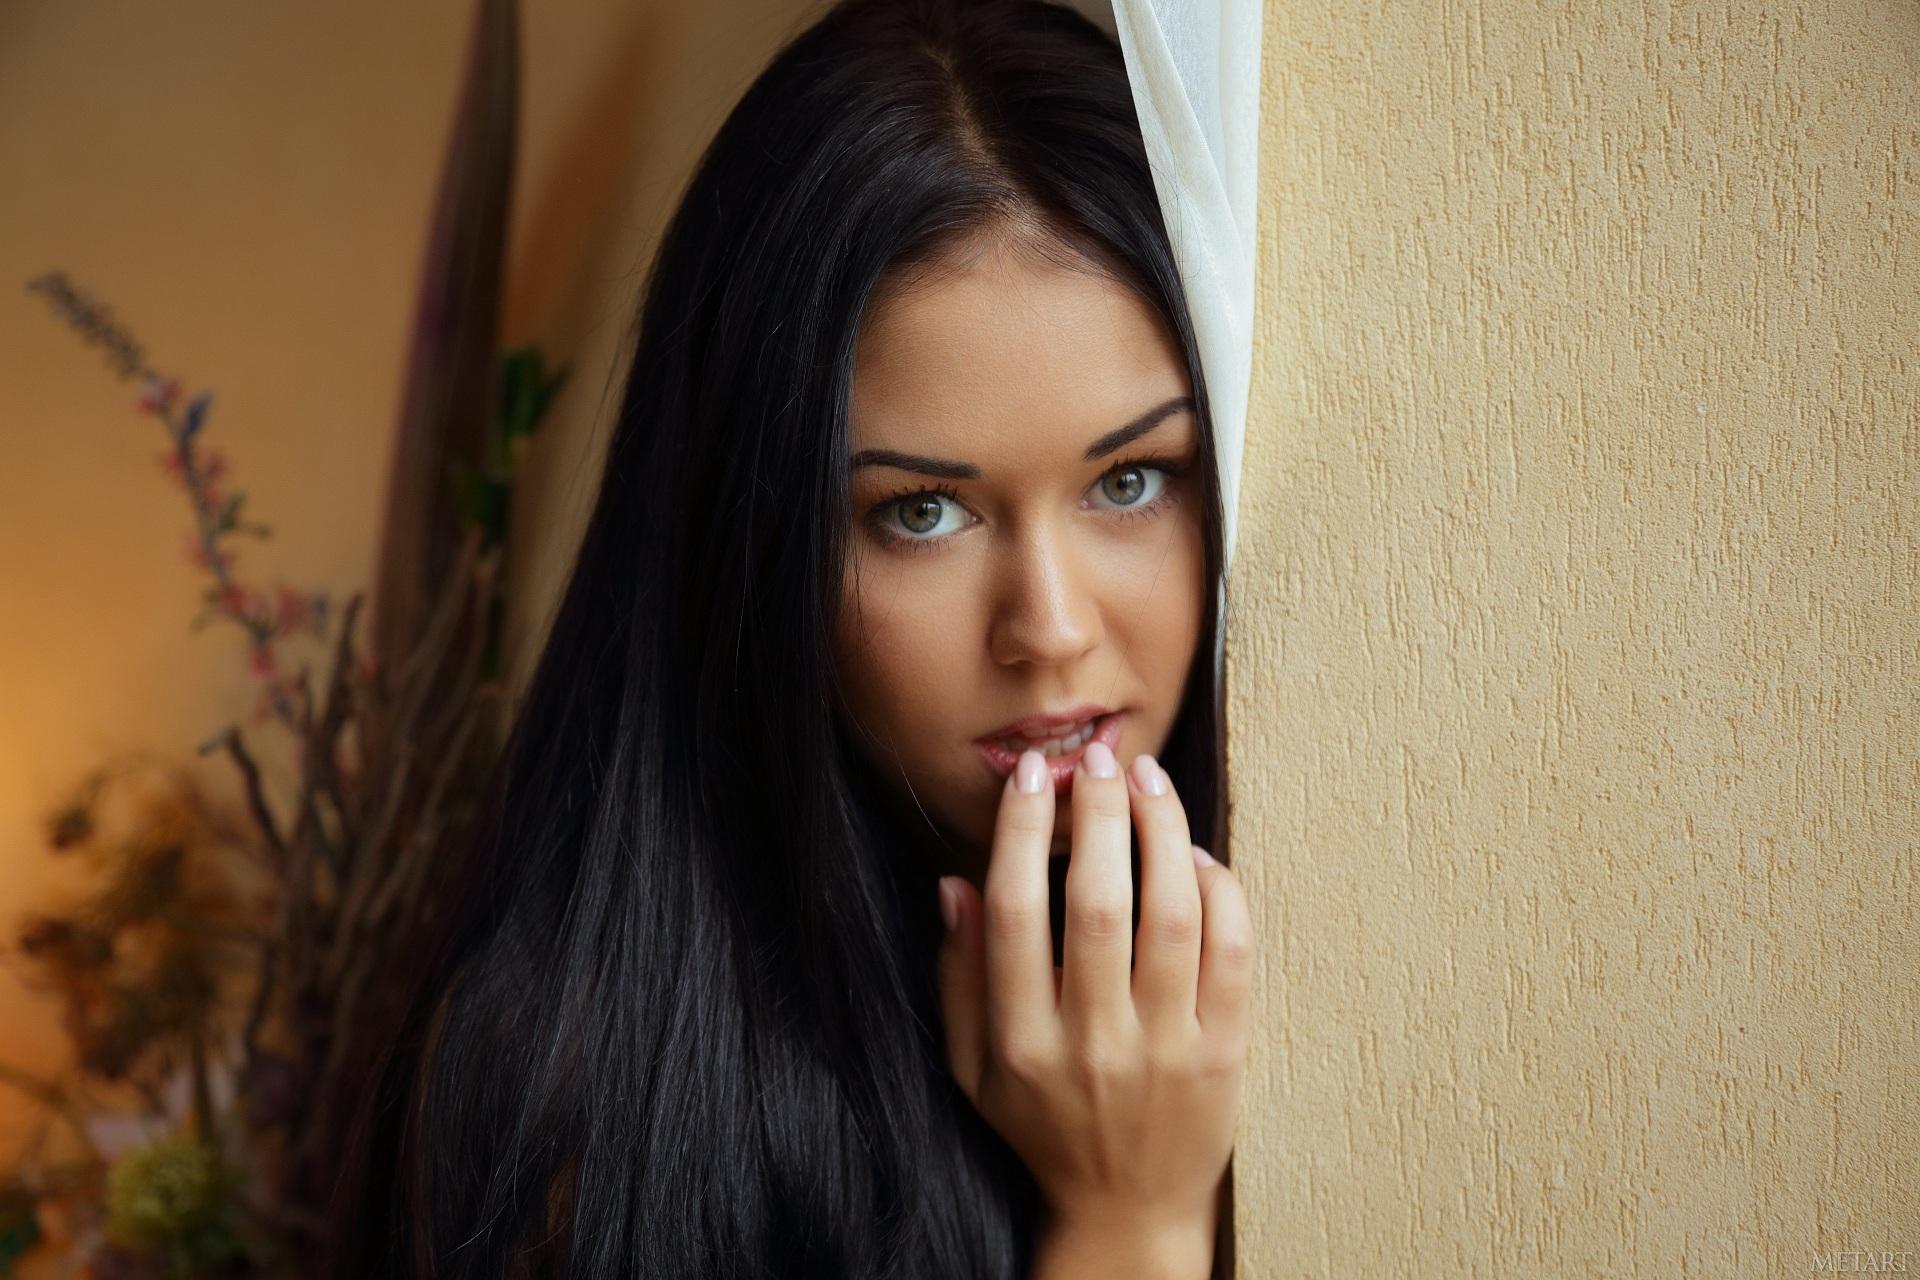 Фотогалерея одной девушки